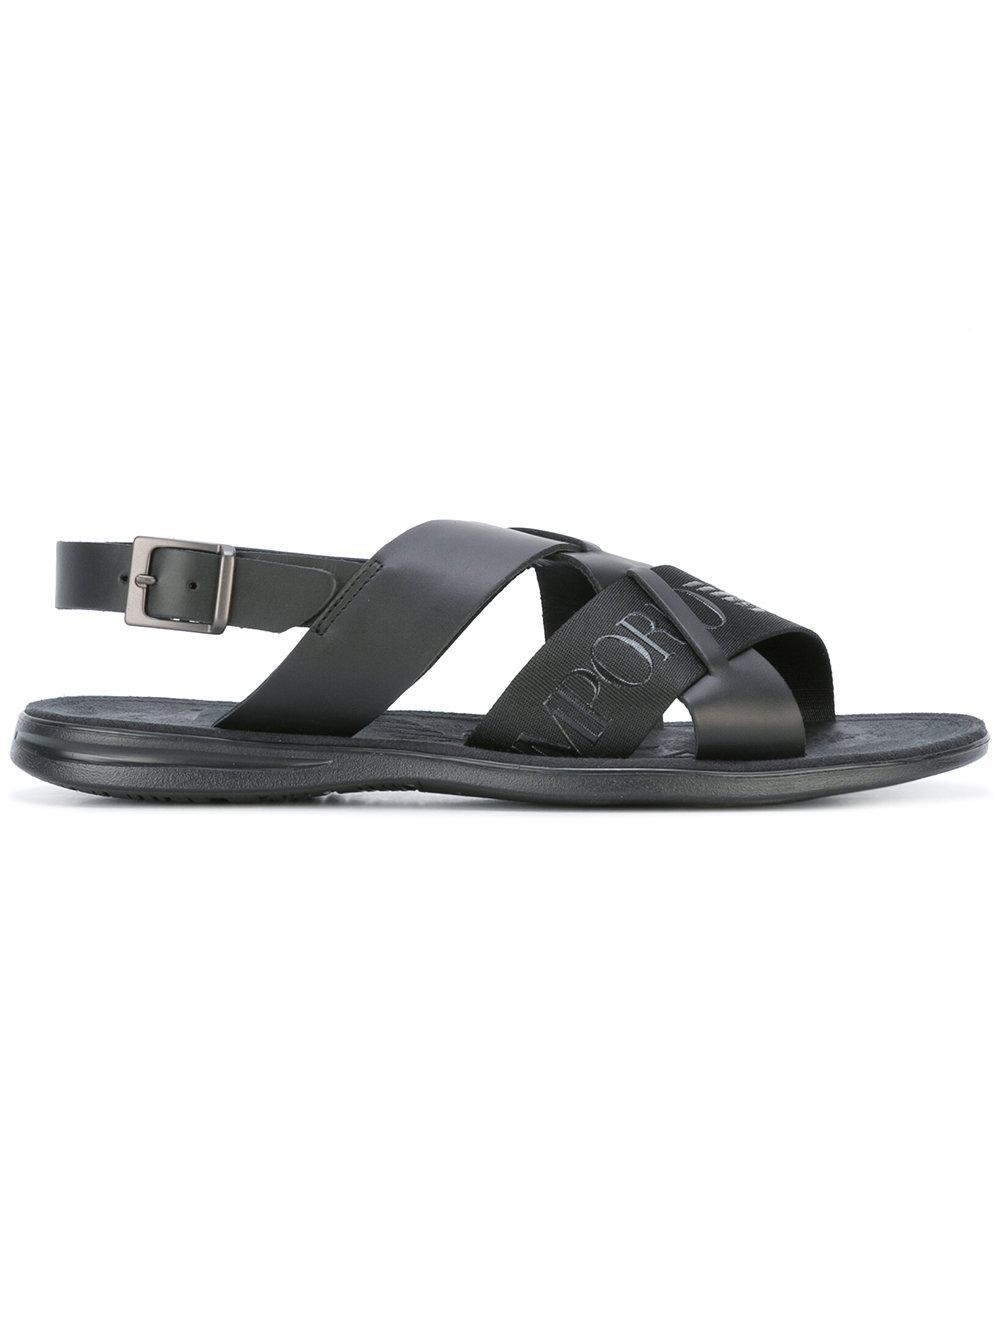 Emporio Armani Logo Sandals In Black Lyst